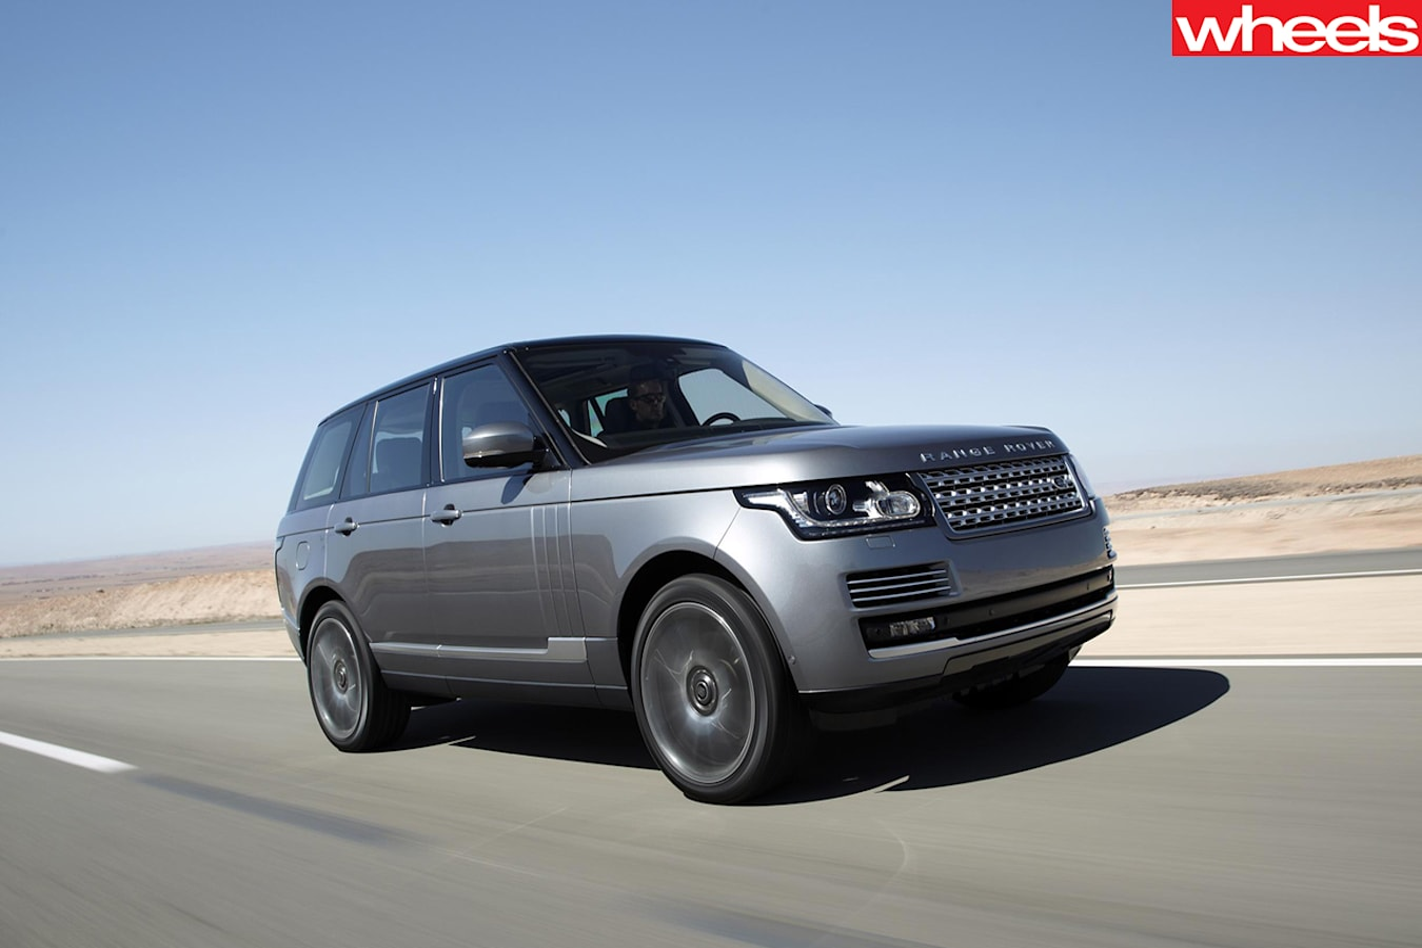 Range Rover Vogue SDV8